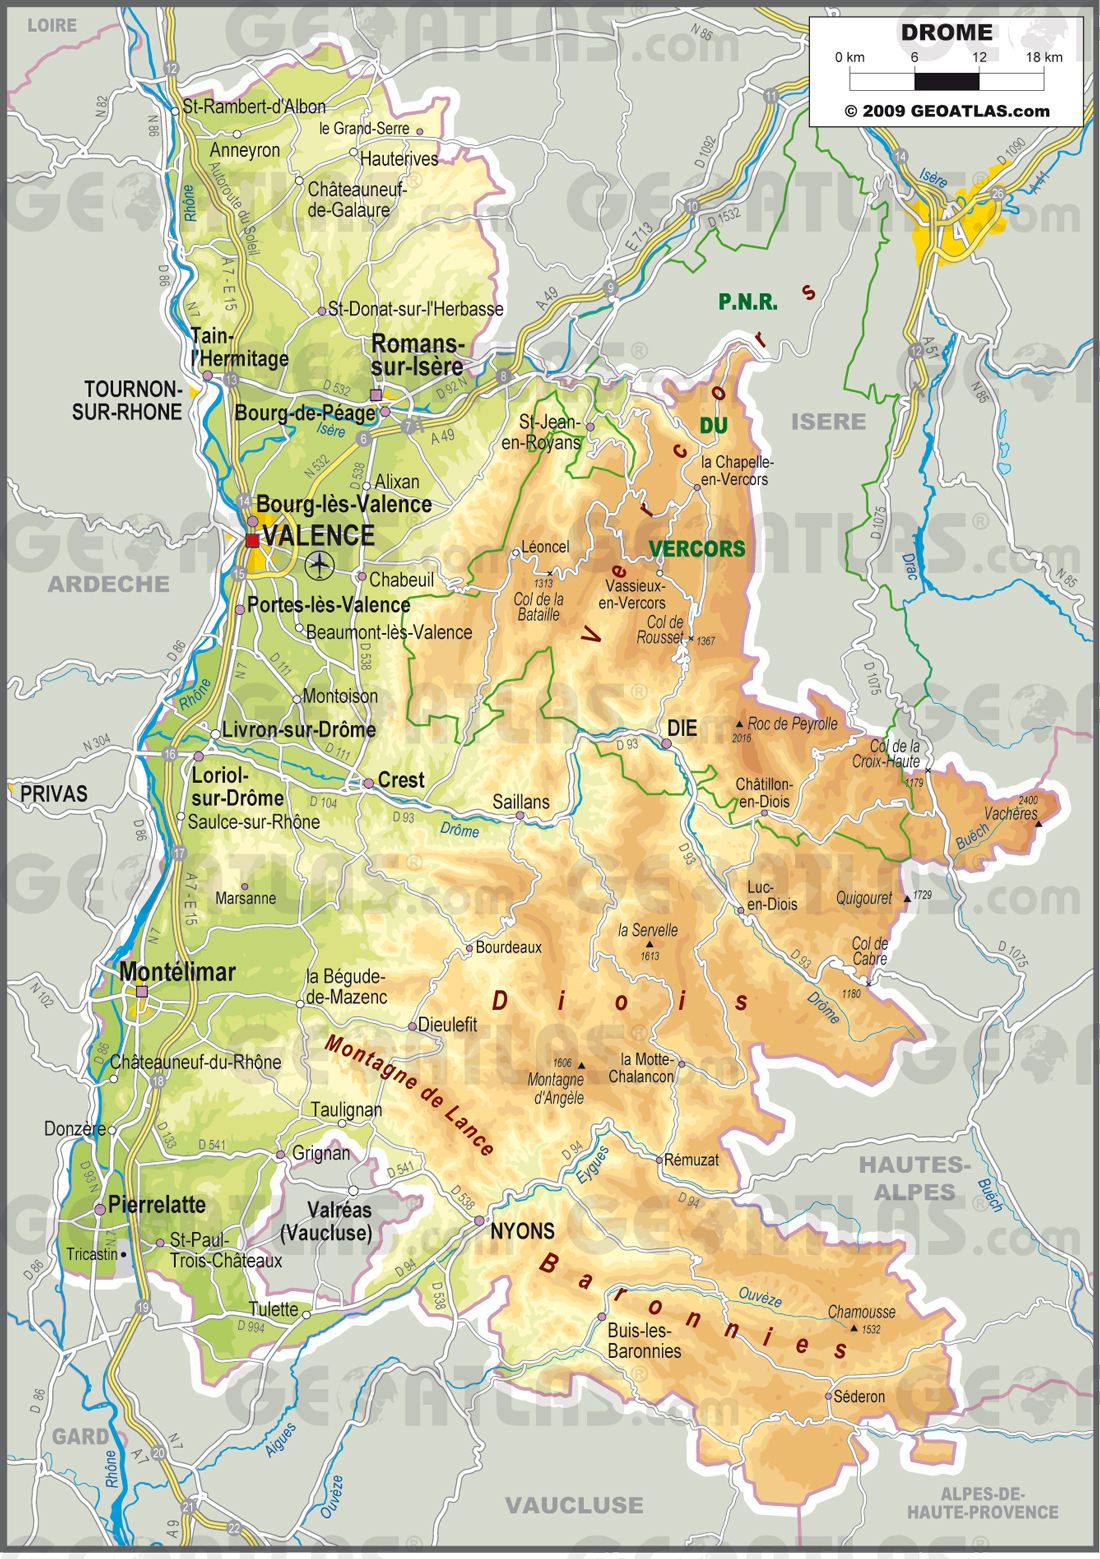 Drôme carte